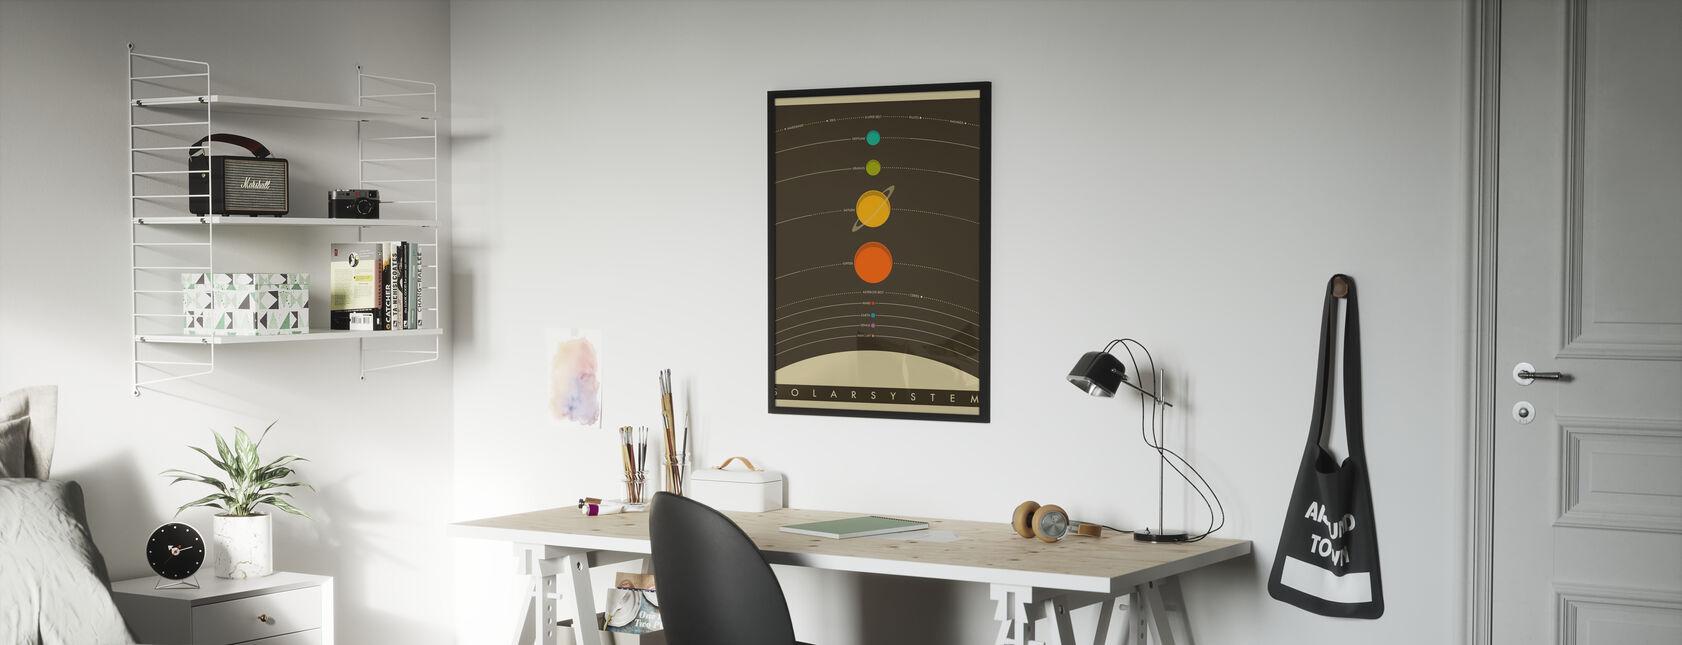 Solsystem - Brun - Plakat - Barnerom